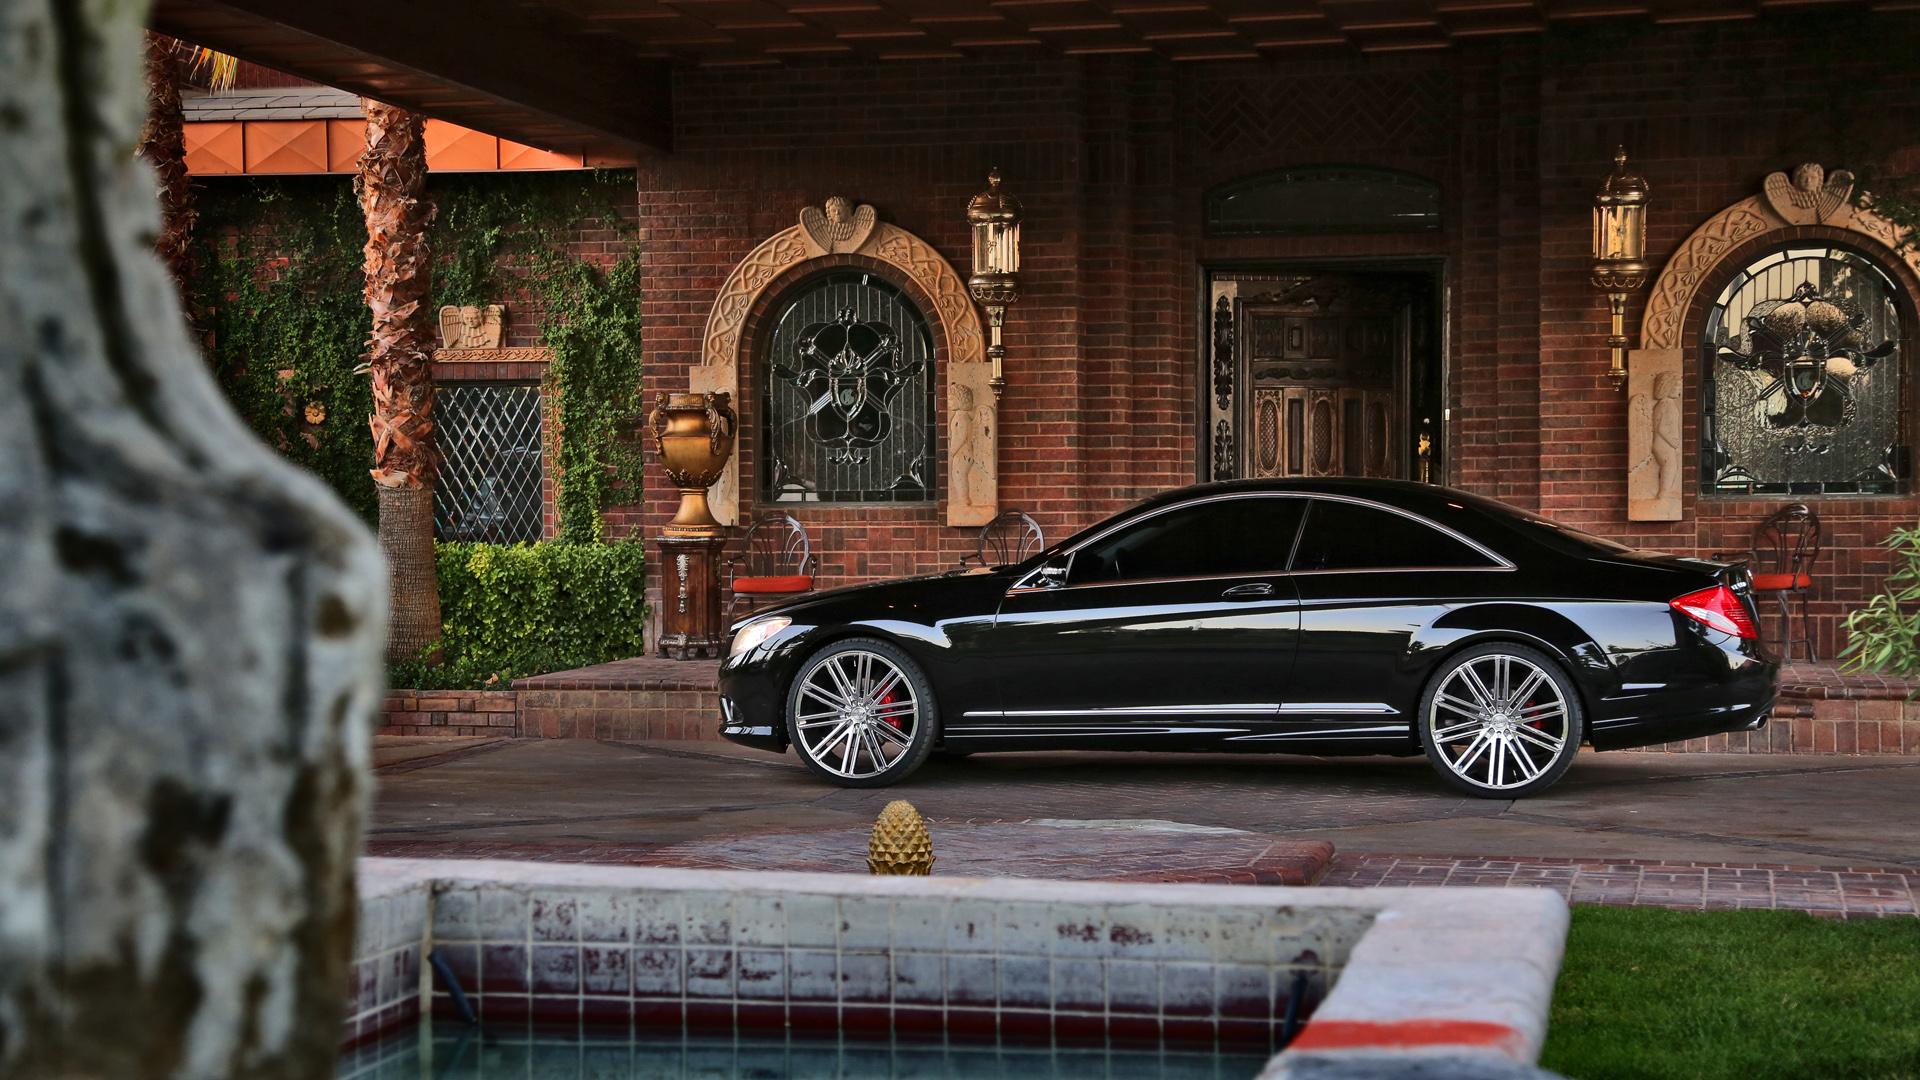 2010 Mercedes Benz Cl550 Hh11 Heavy Hitter Wheels